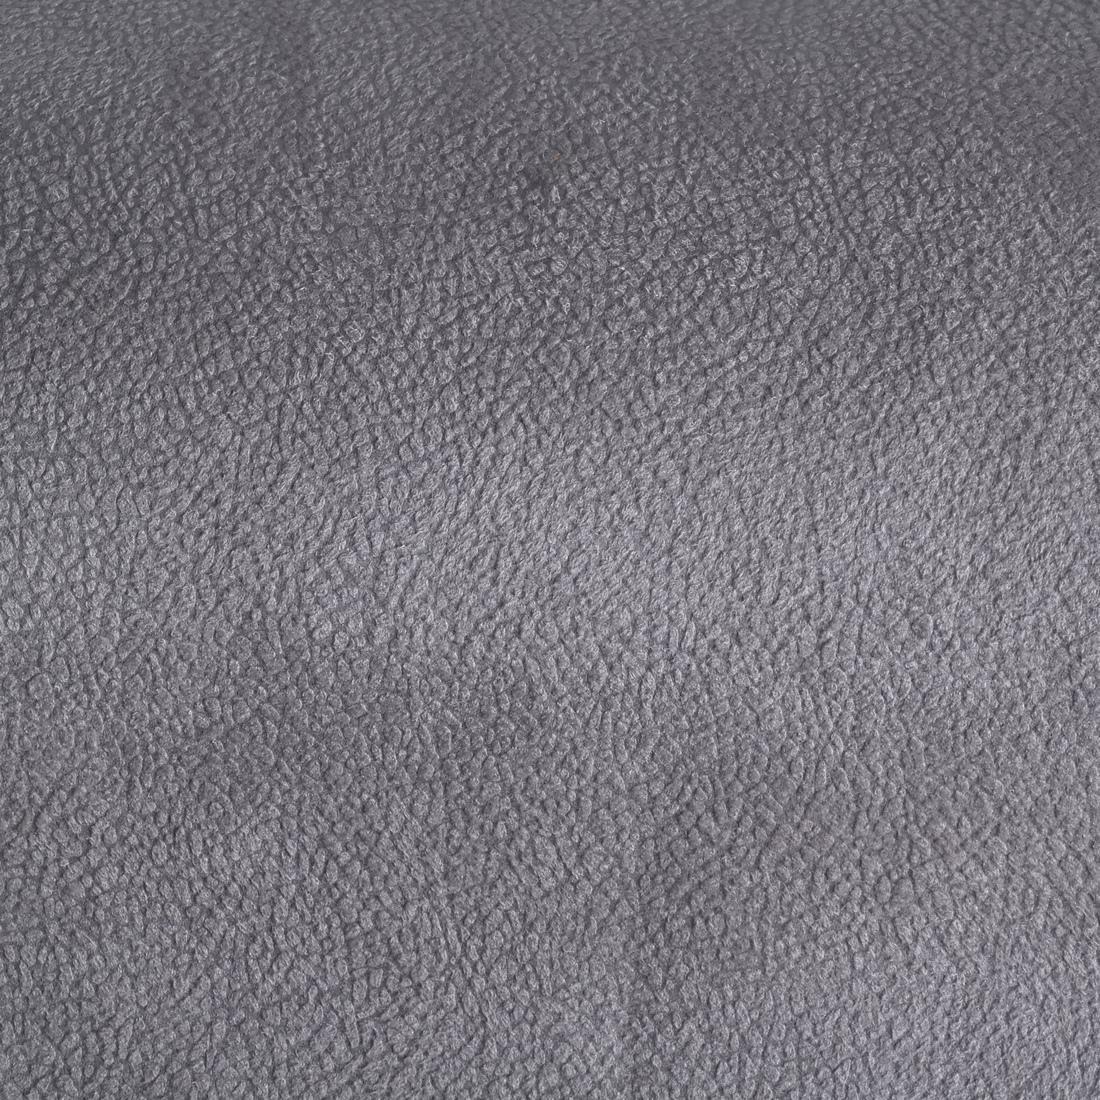 Lavender Grey Modern Designer Fabrics: 4 Bolts - 2